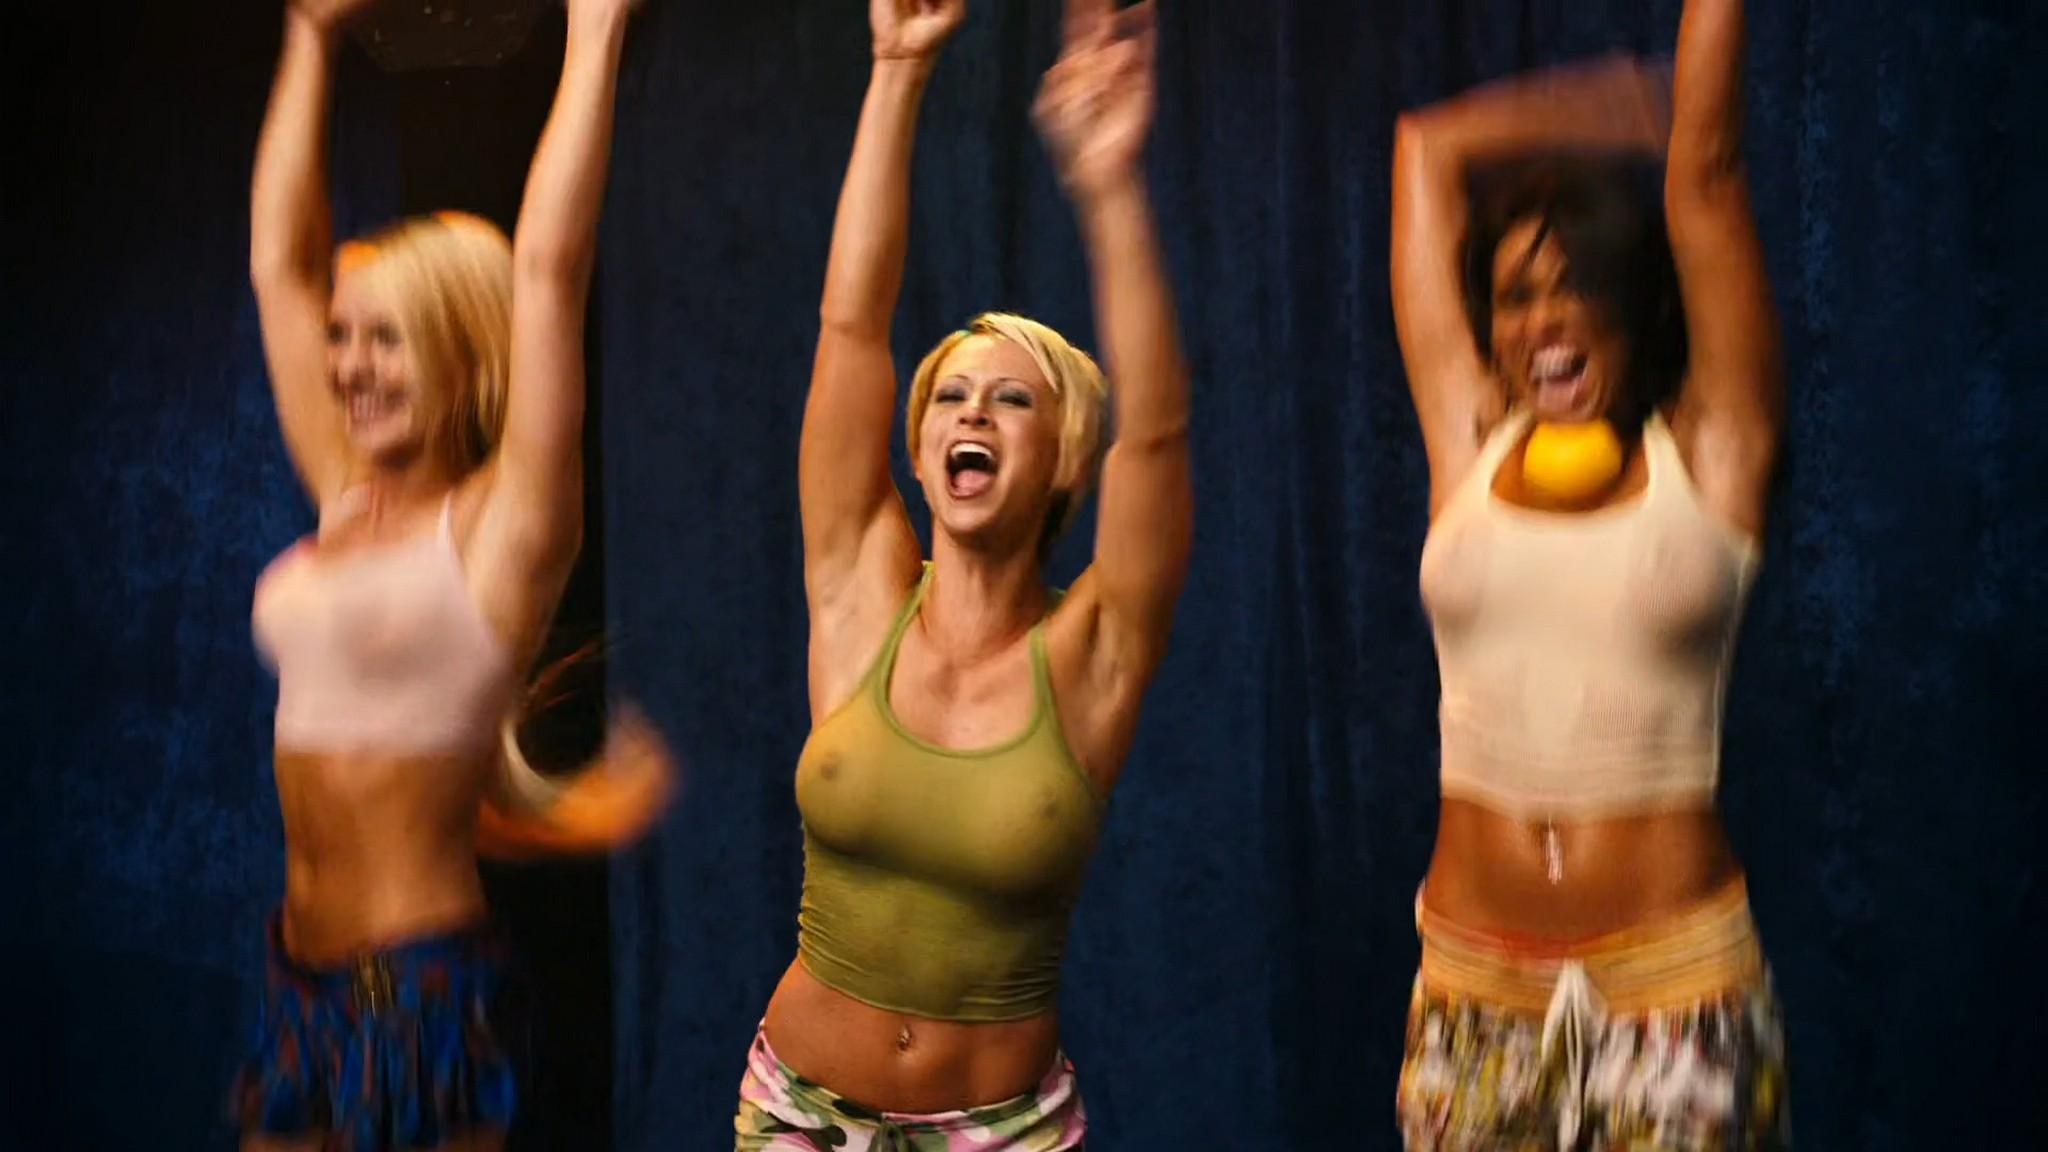 Danneel Ackles nude Carmen Electra, Arielle Kebbel, sexy otherrs nude and hot - Mardi Gras: Spring Break (2011) HD 1080p WEb (16)